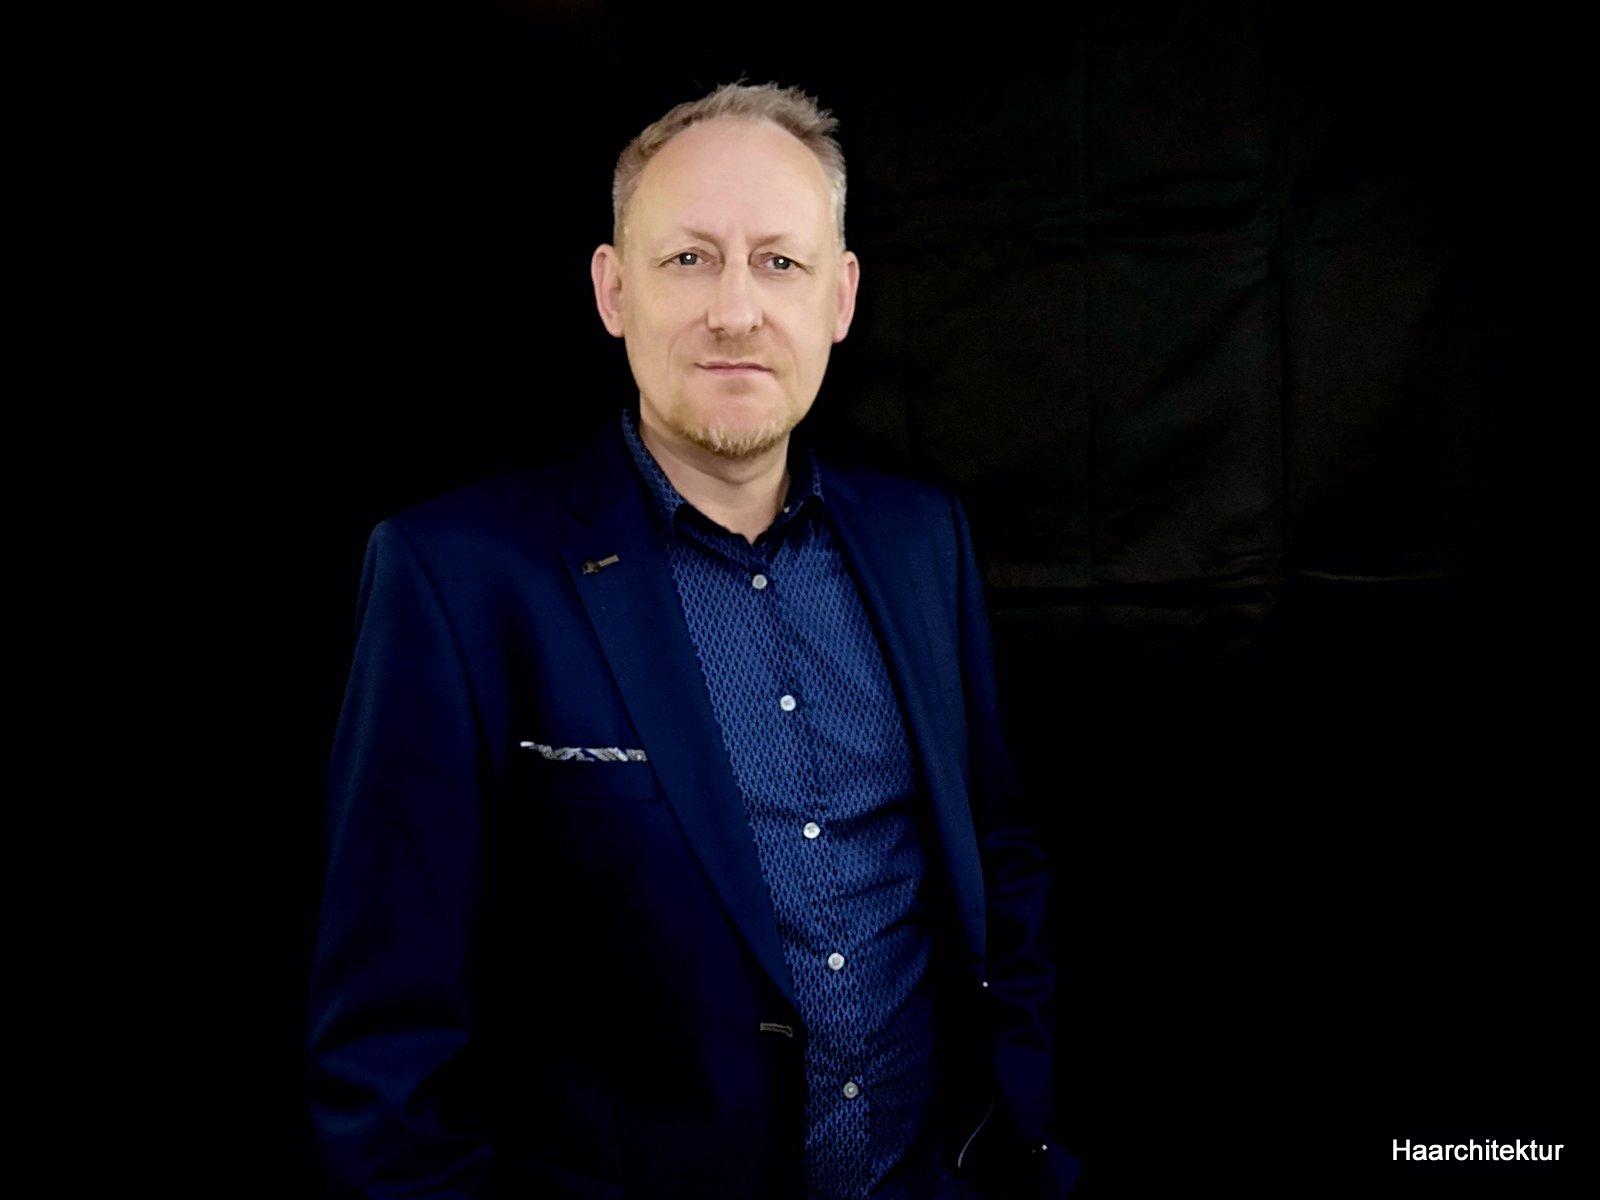 Friseursalon Haarchitektur Lueneburg - Team - Christian Funk